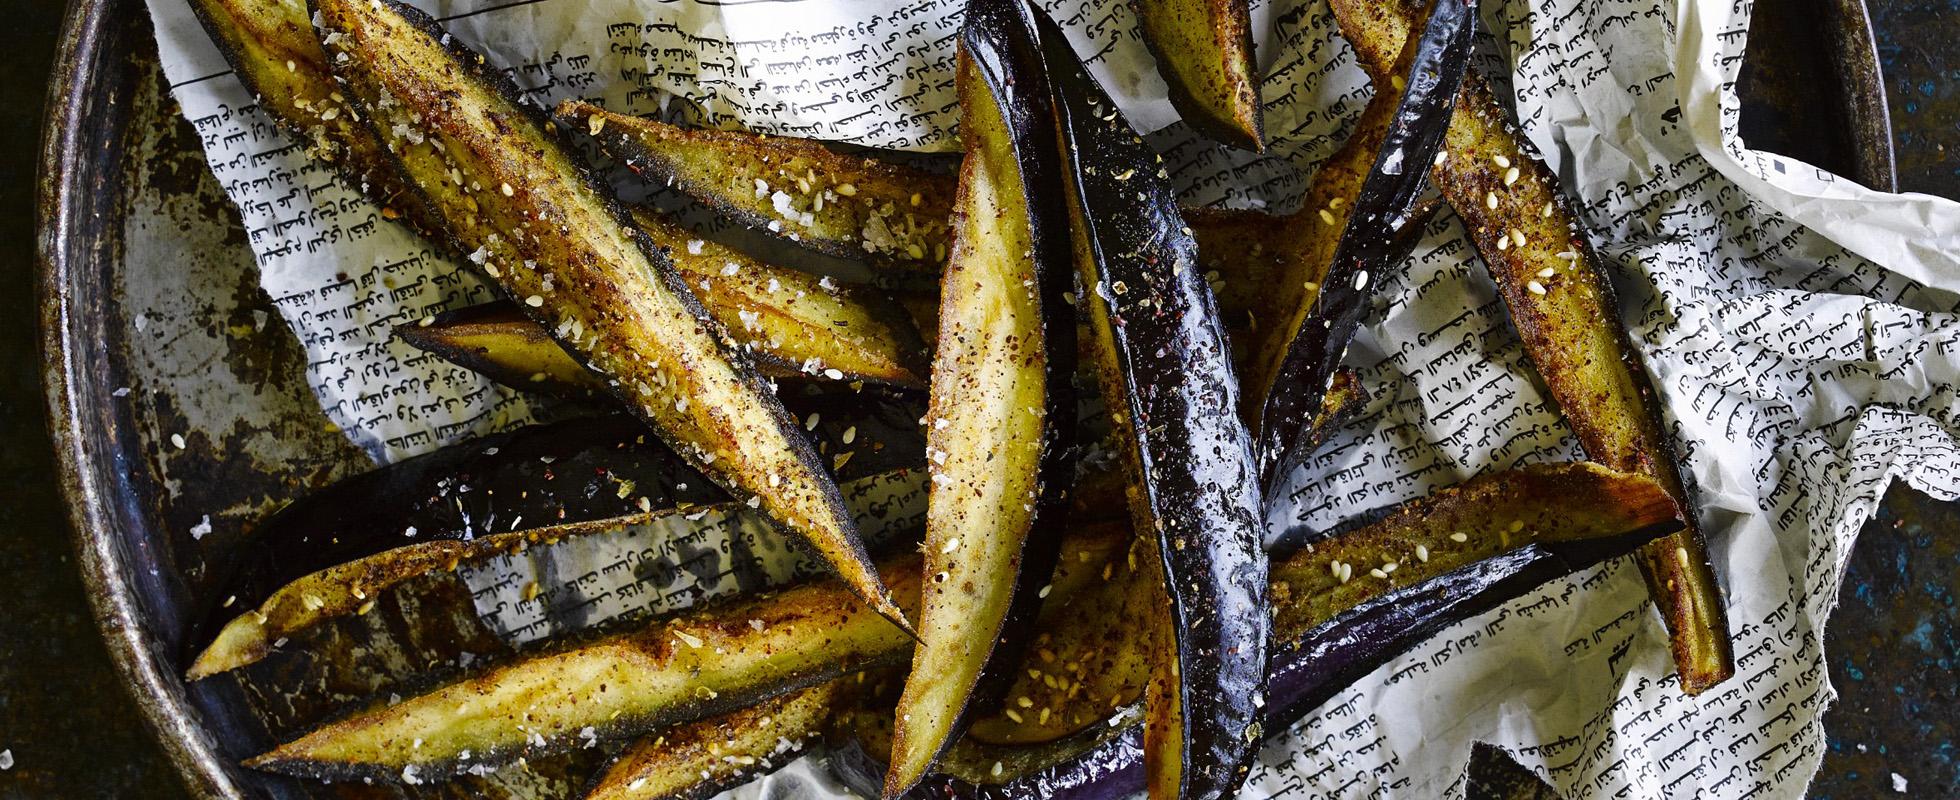 Aubergine sticks with sumac and honey